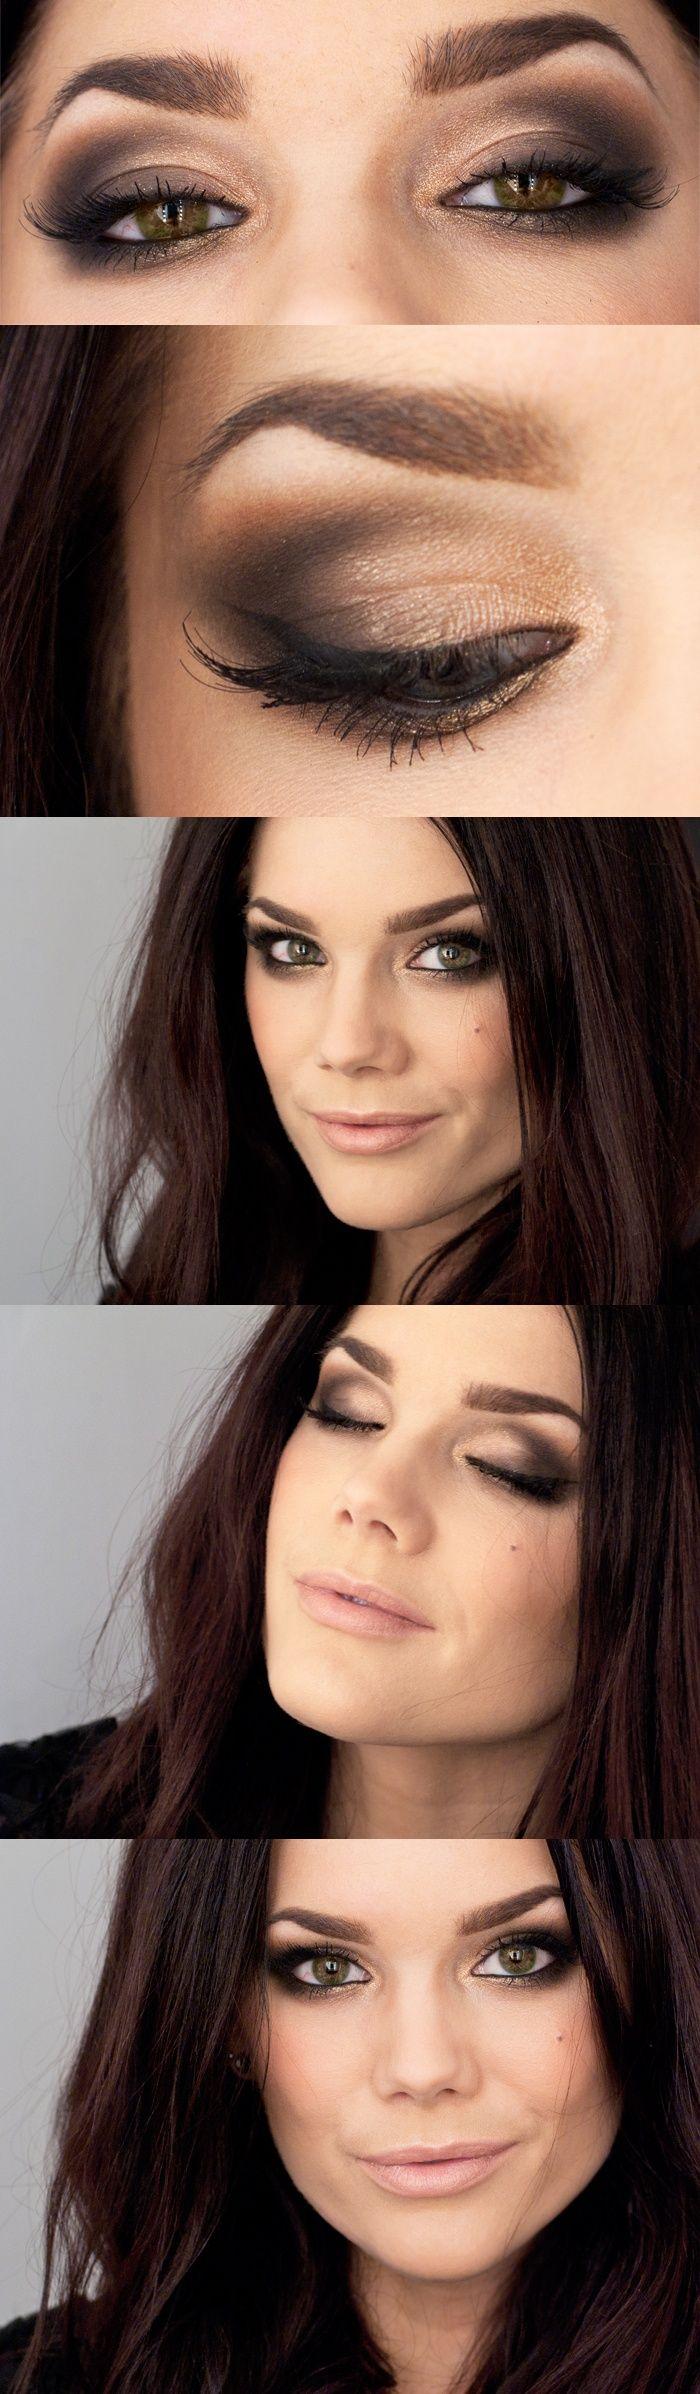 eye-opening smokey eye. Love her hair too!!